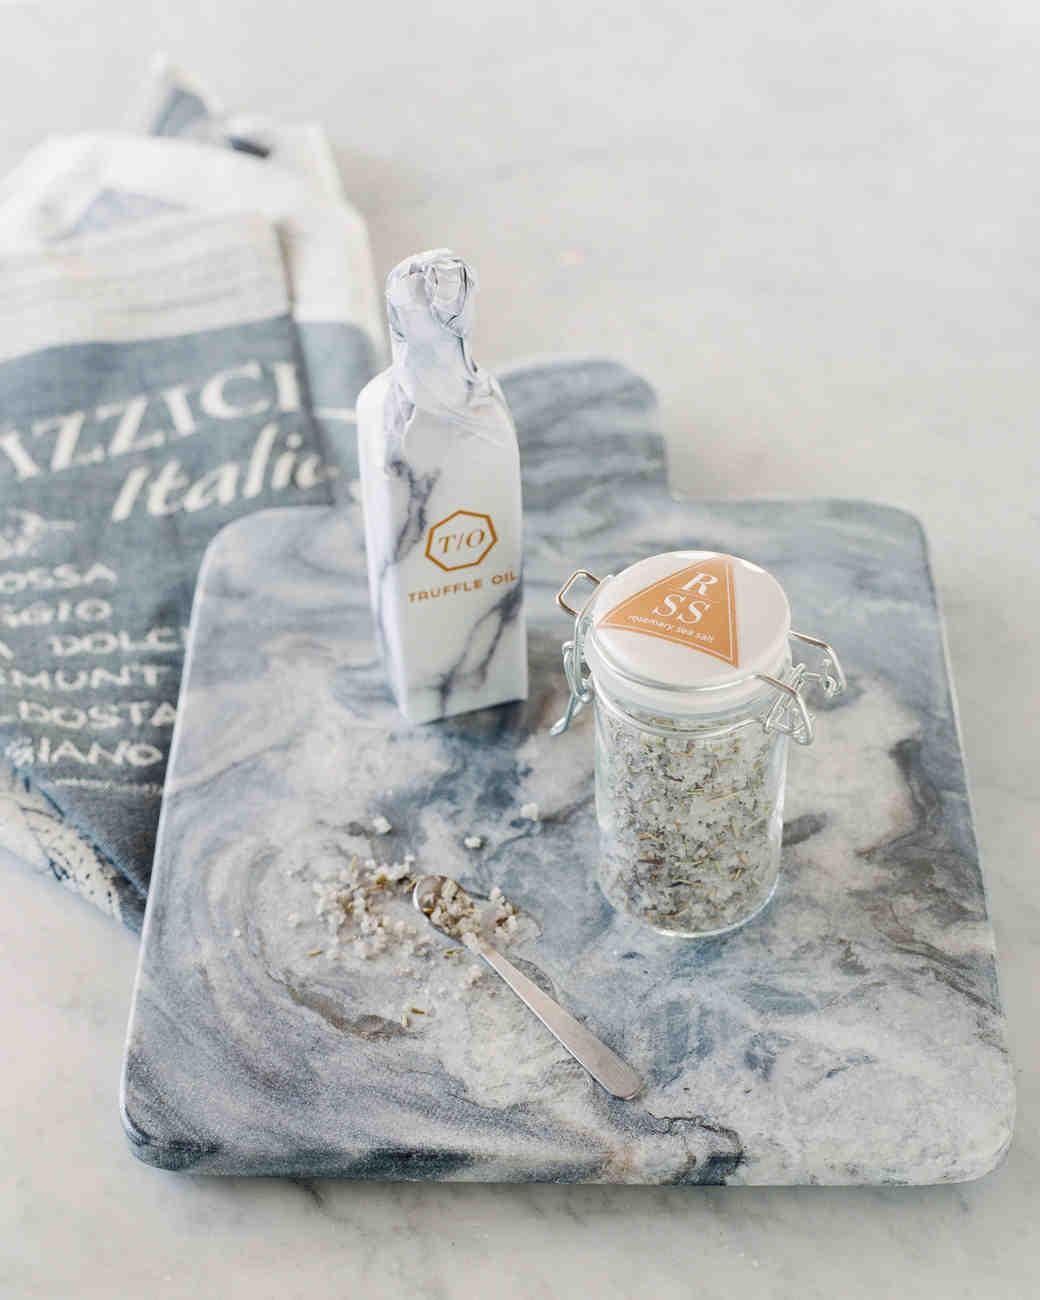 dennis-bryan-wedding-italy-salt-oil-favors-006-0070-s112633.jpg